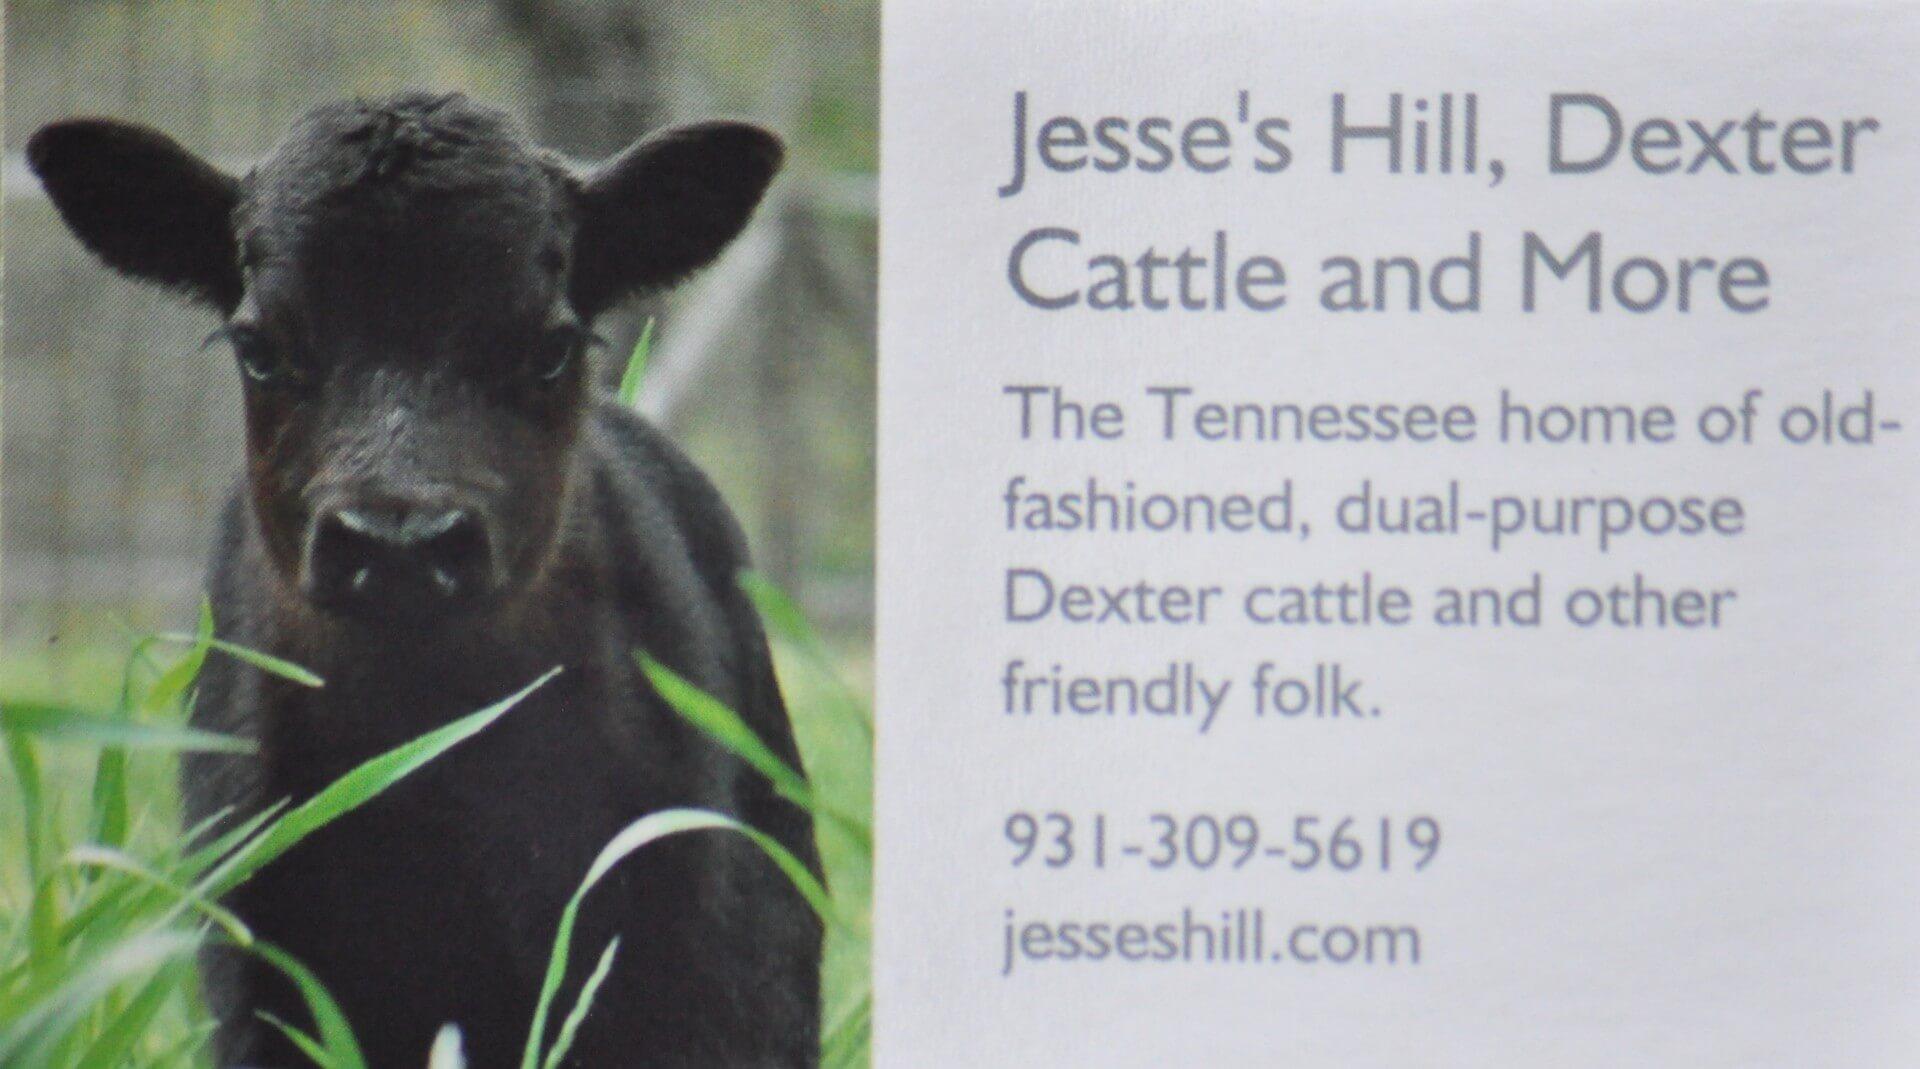 Jesse's Hill Dexters